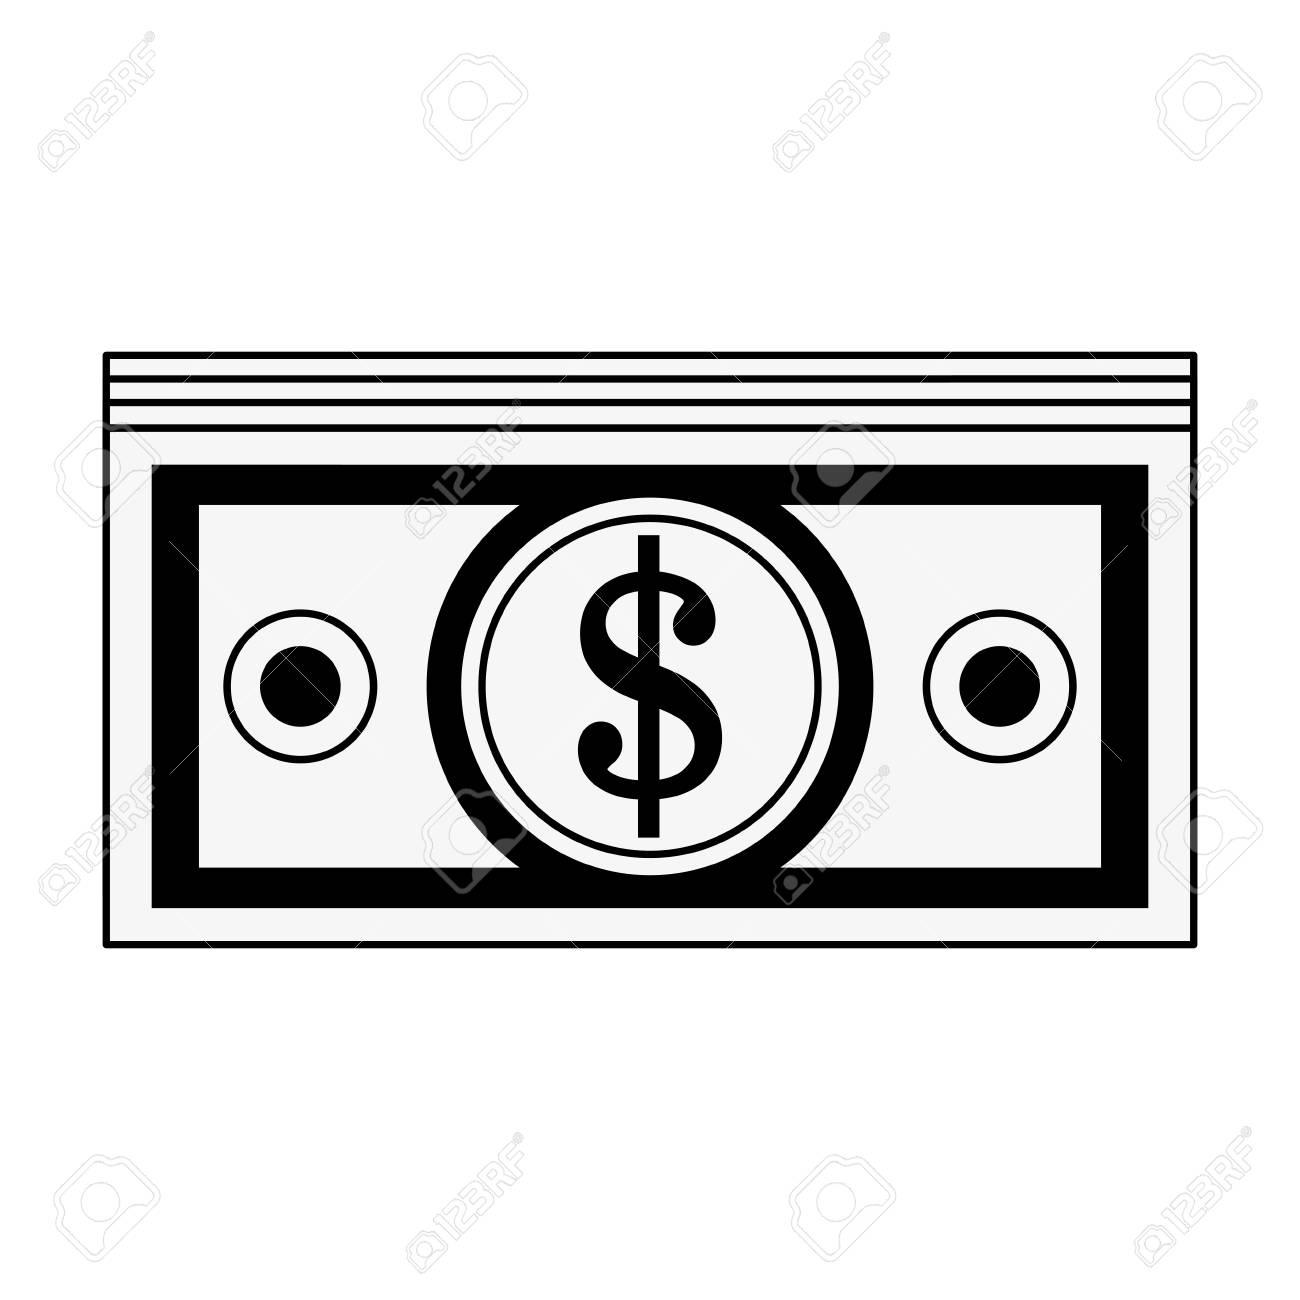 dollar bills money icon image vector illustration design black rh 123rf com